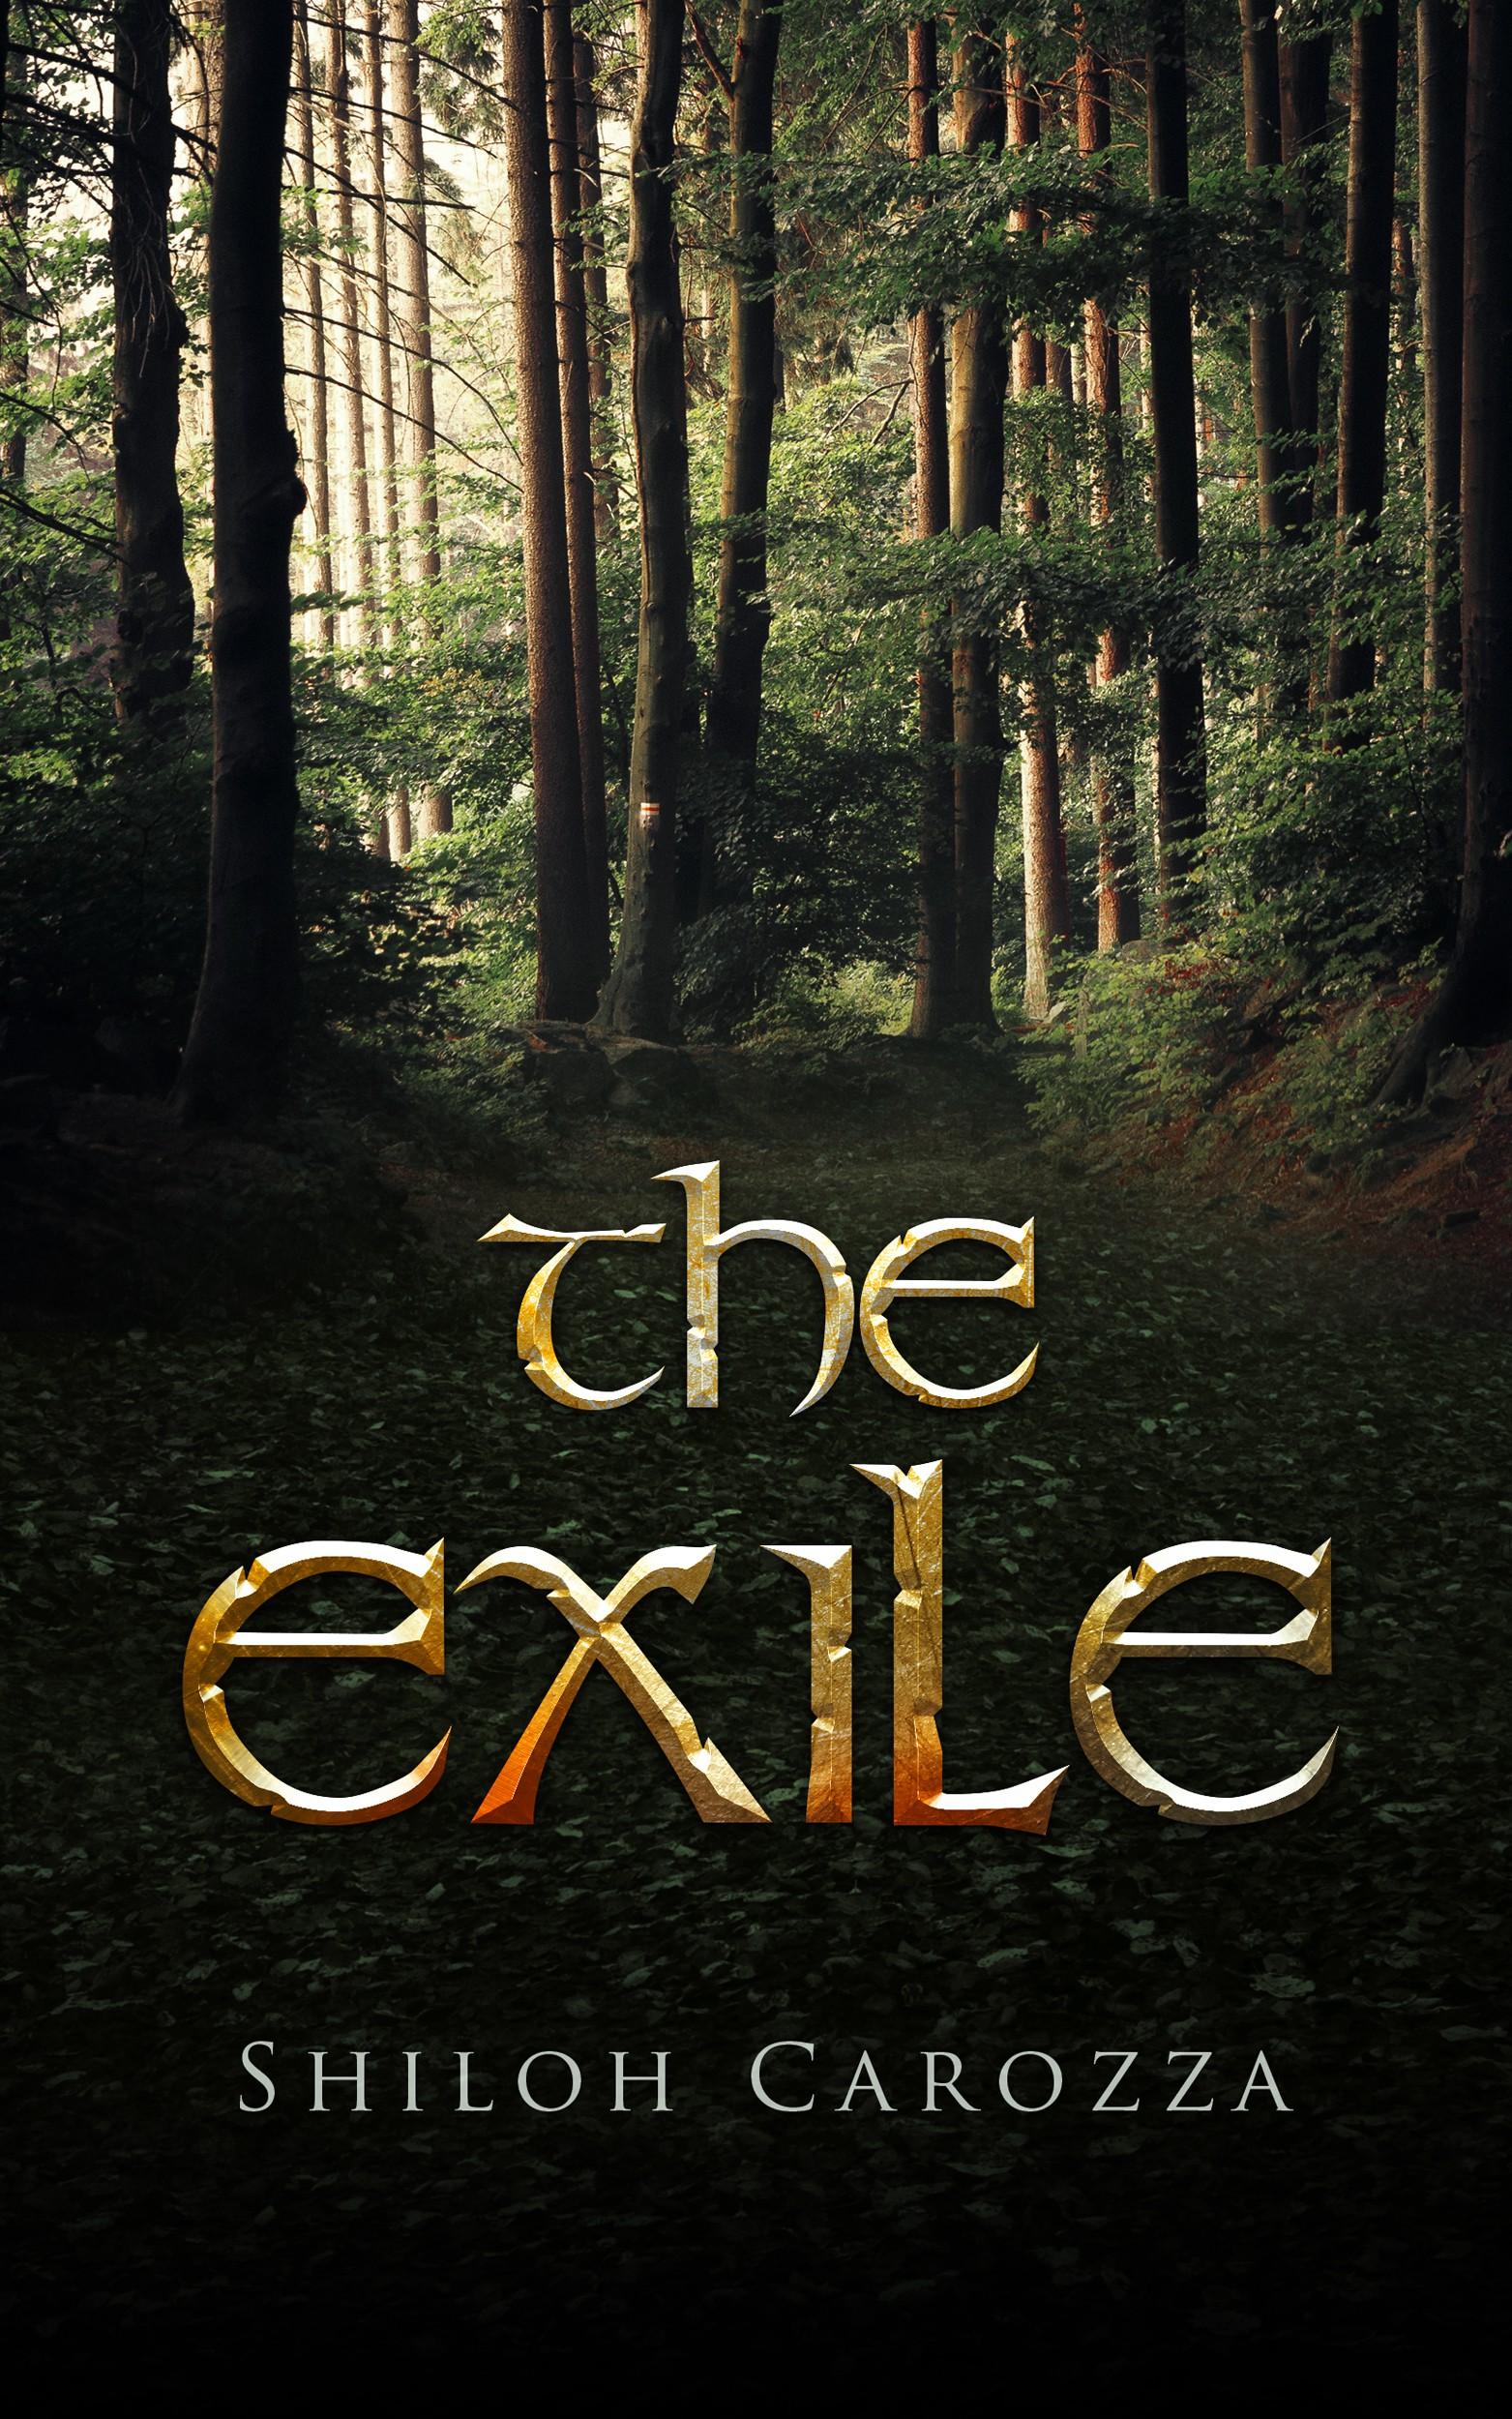 Create cover for medieval Scandinavian adventure novel The Exile